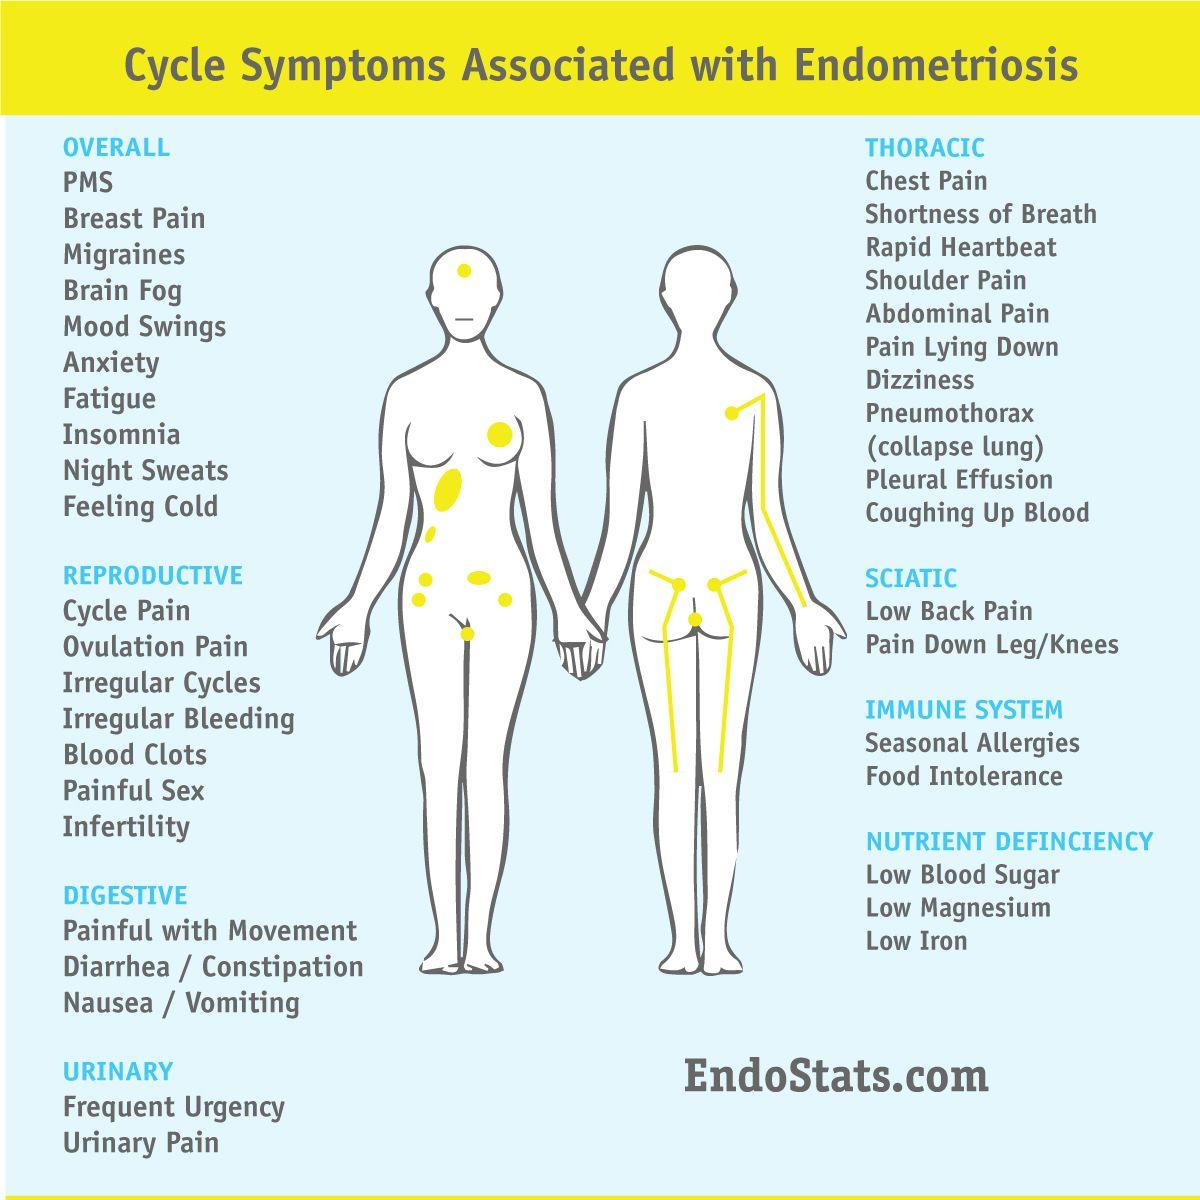 Endometriosis Symptoms | EndoStats | Endometriosis symptoms